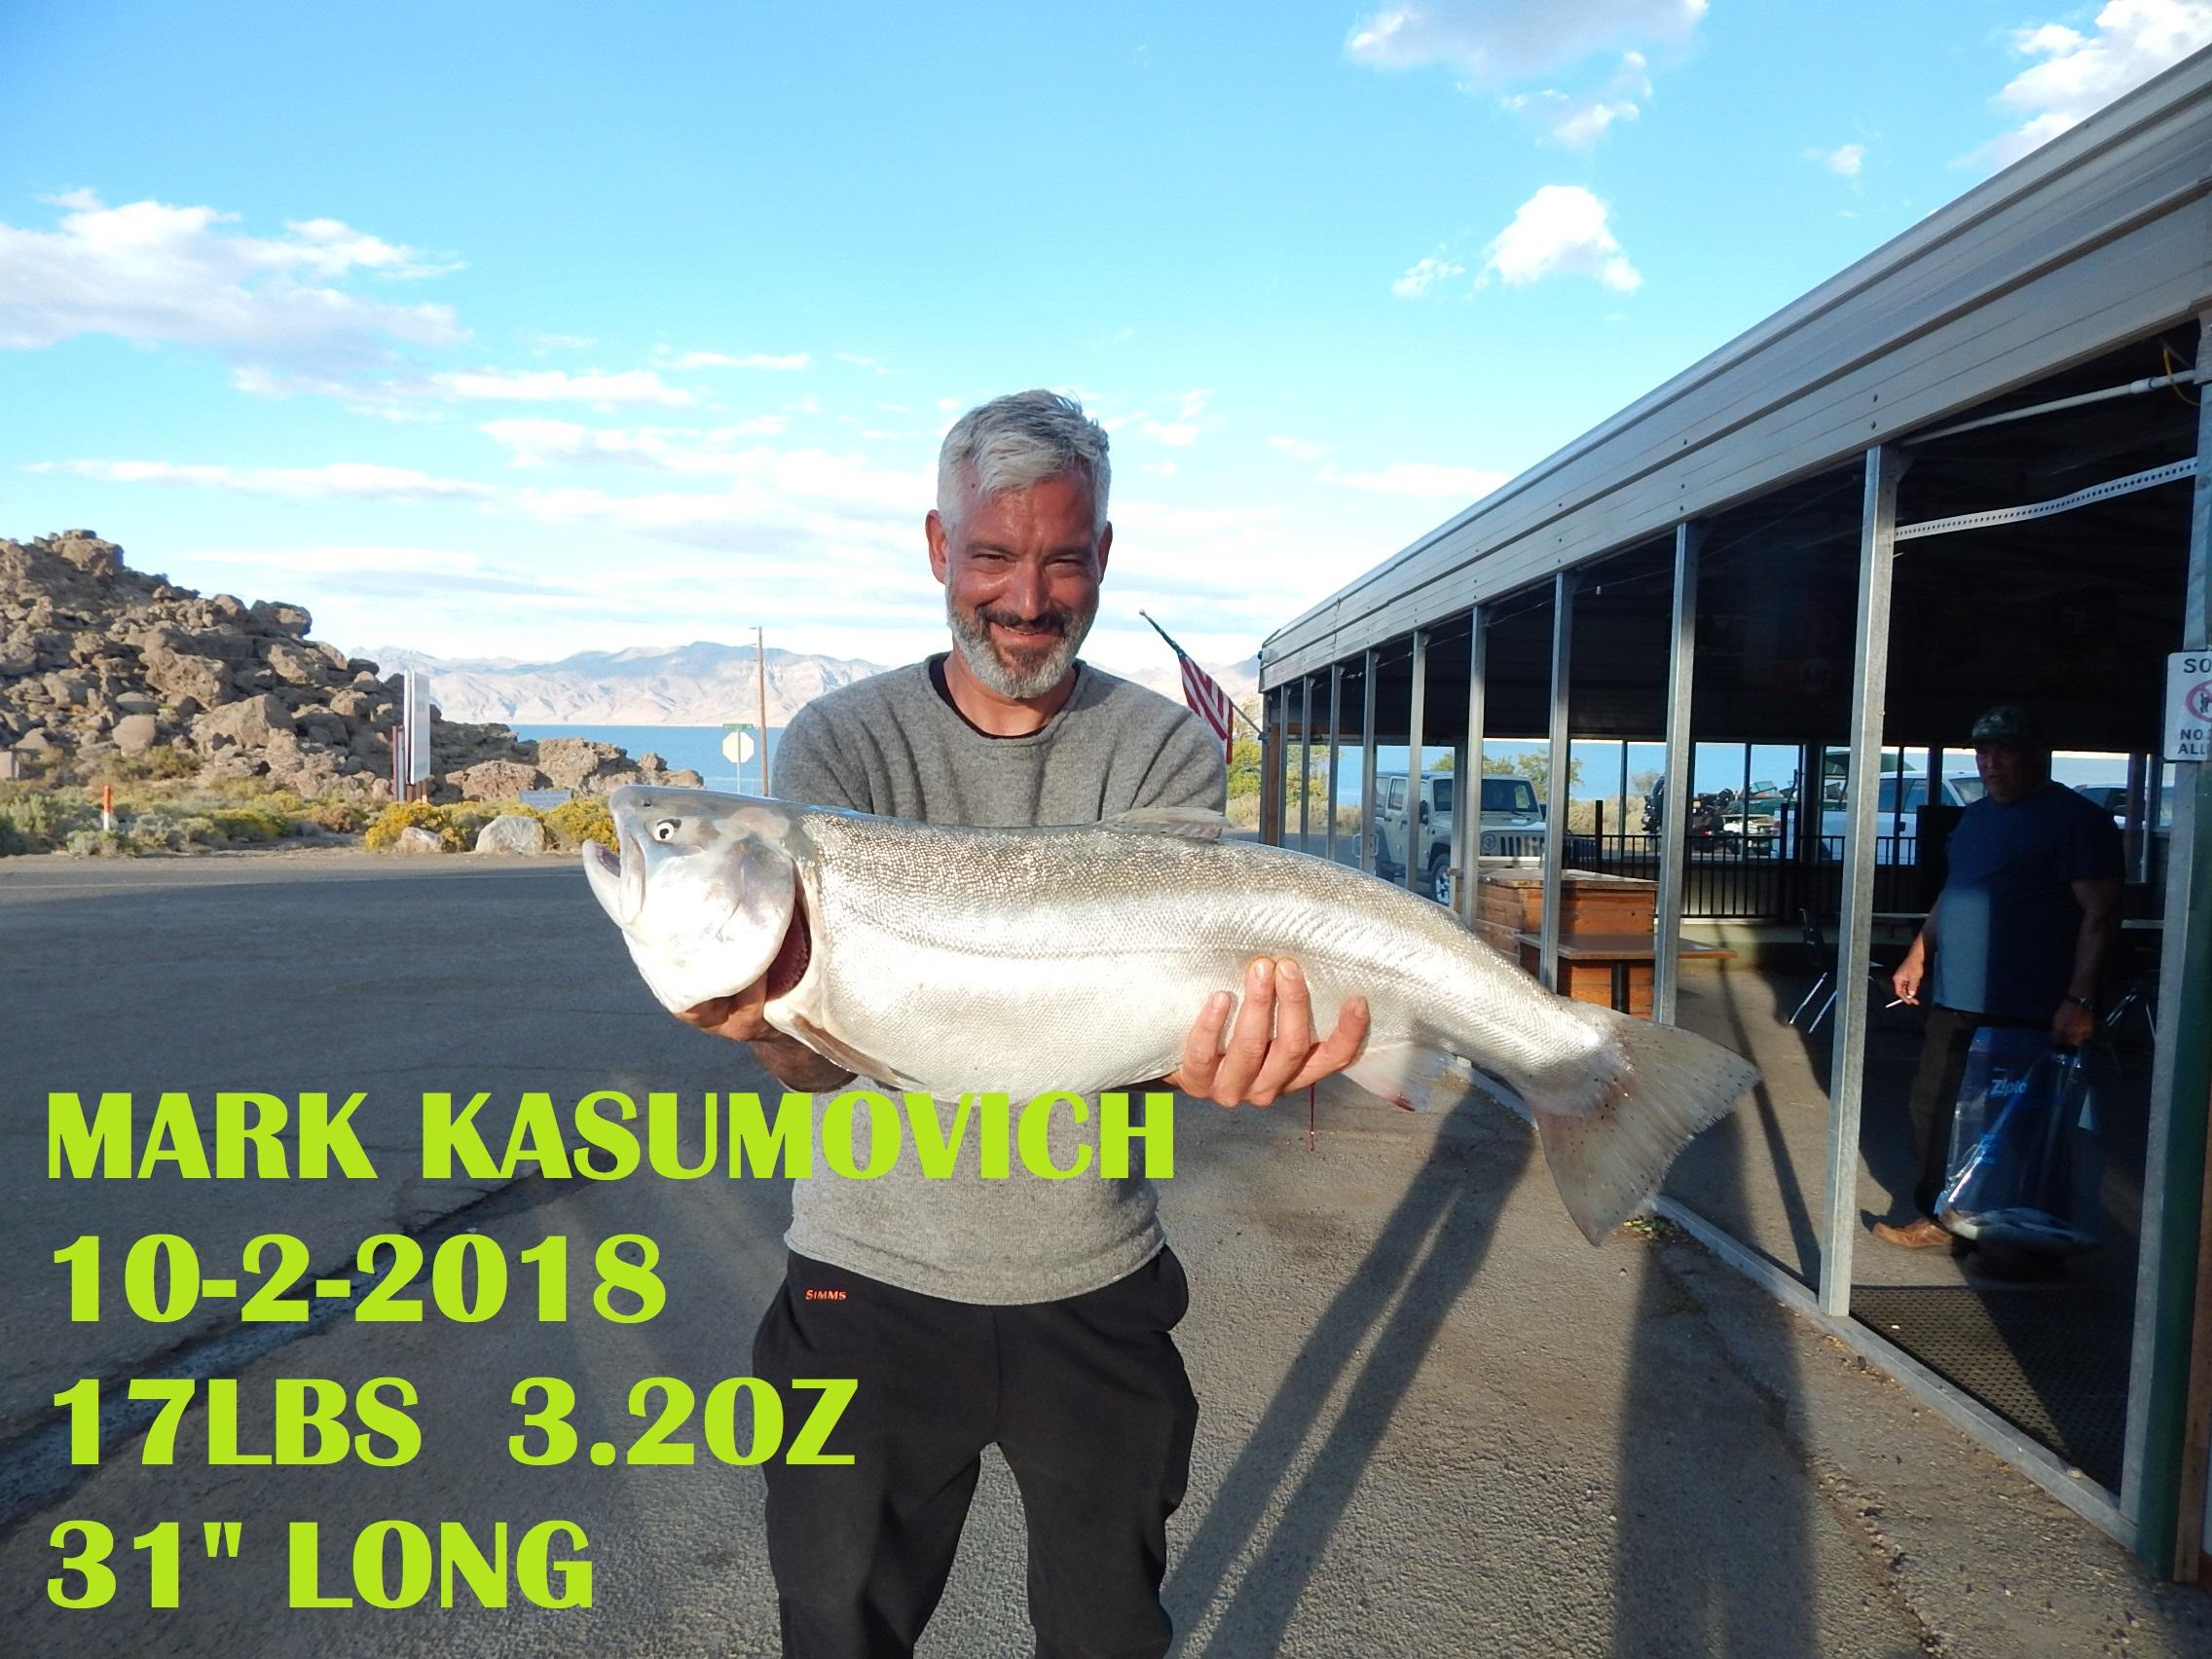 MARK KASUMOVICH 10-2-18.jpg